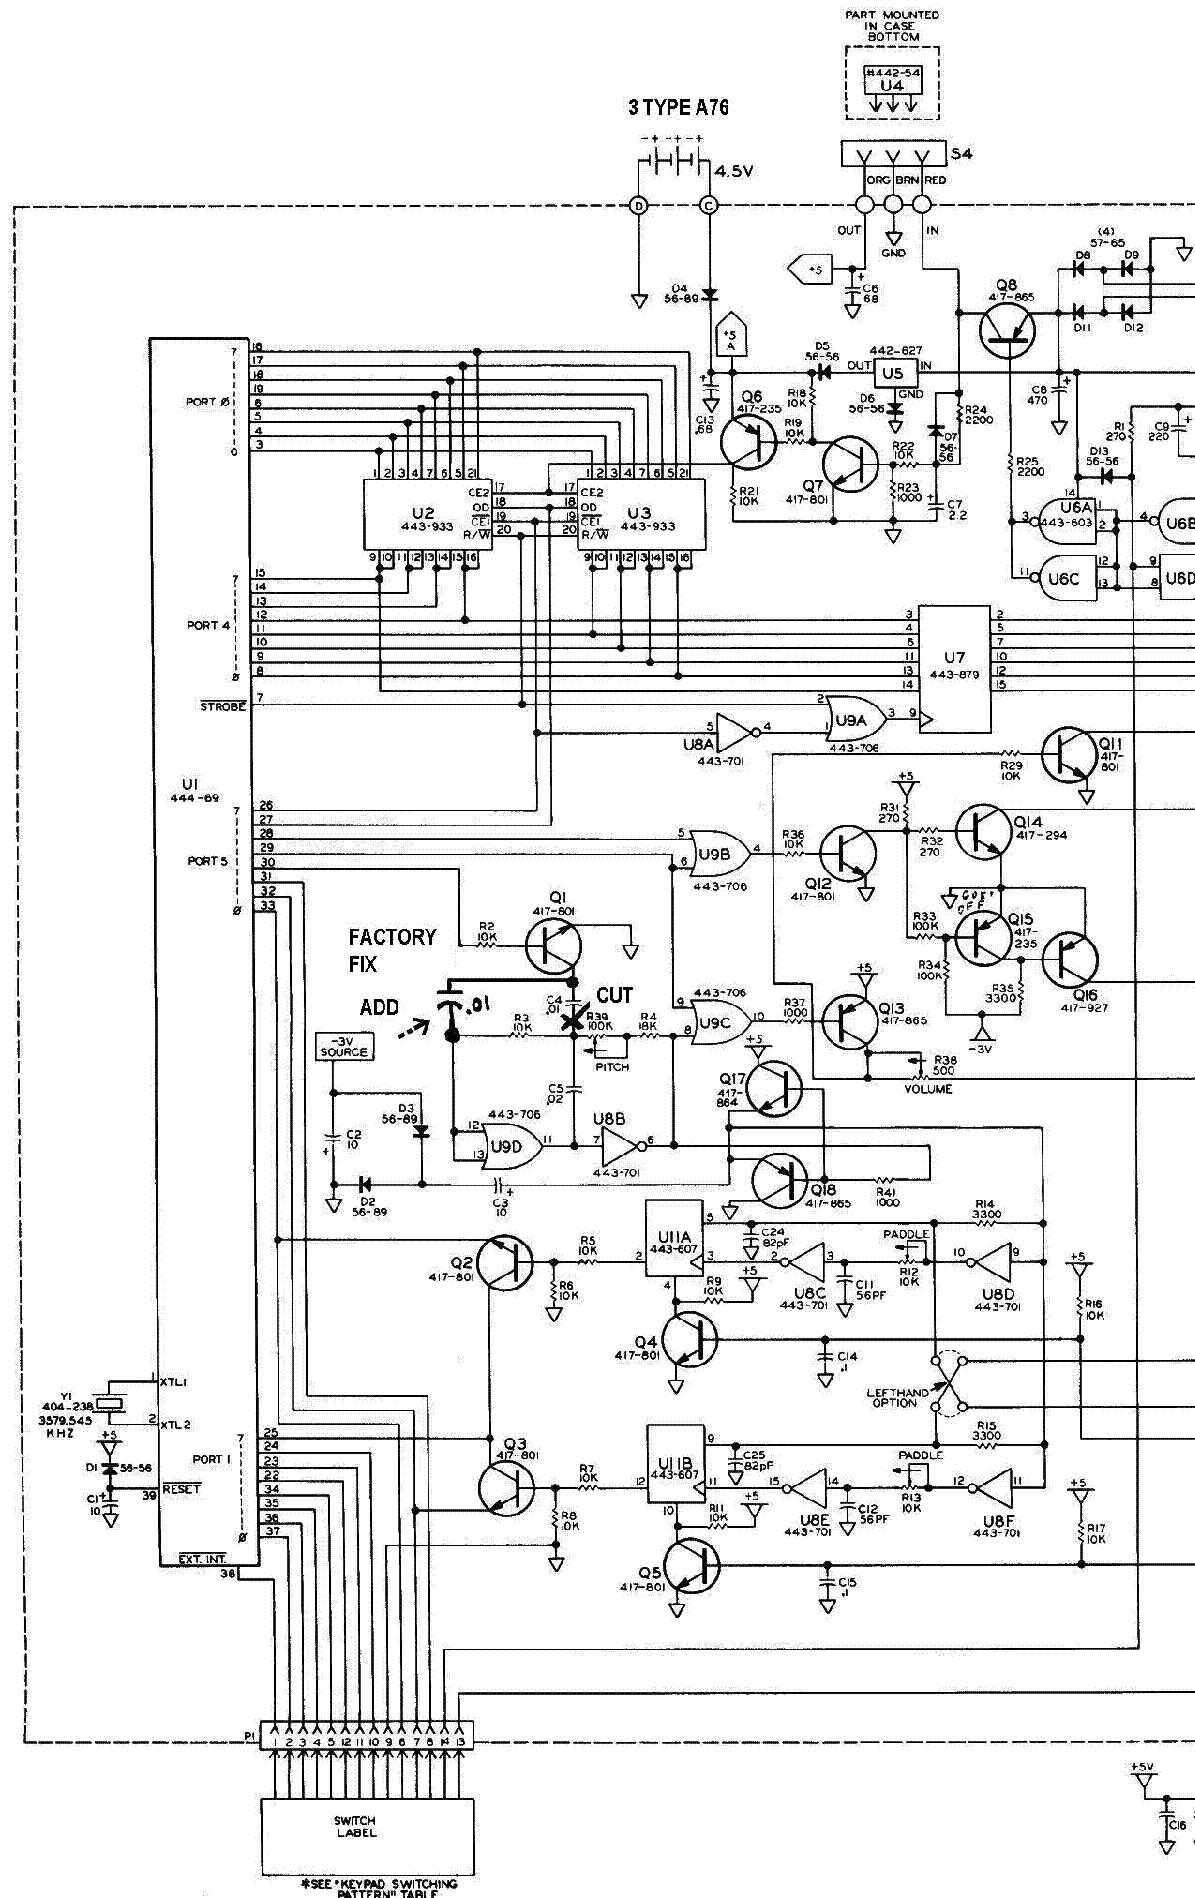 heathkit gd 600 photoelectric light switch sch service manual rh elektrotanya com Heathkit Schematics Heathkit 10 12 Manual